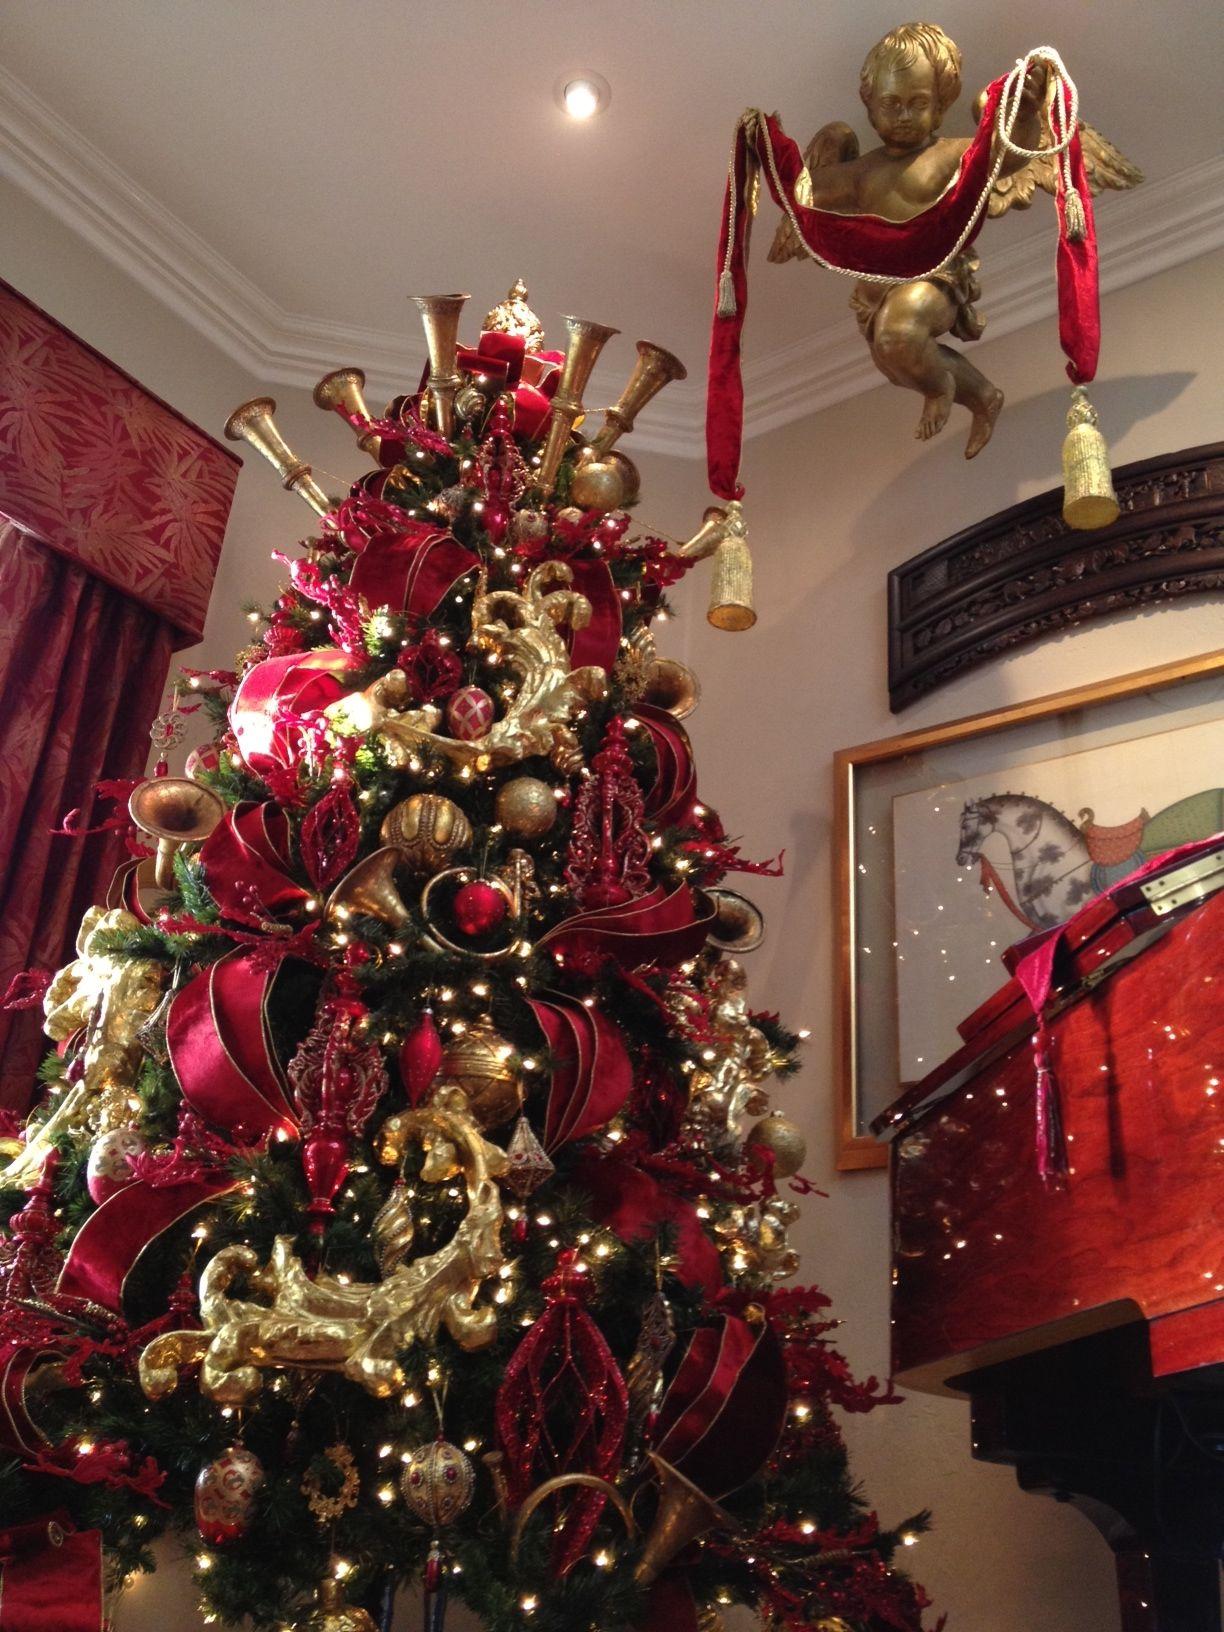 Cherub Christmas tree topper  Exquisite professional Christmas decor by Nicholas Christmas